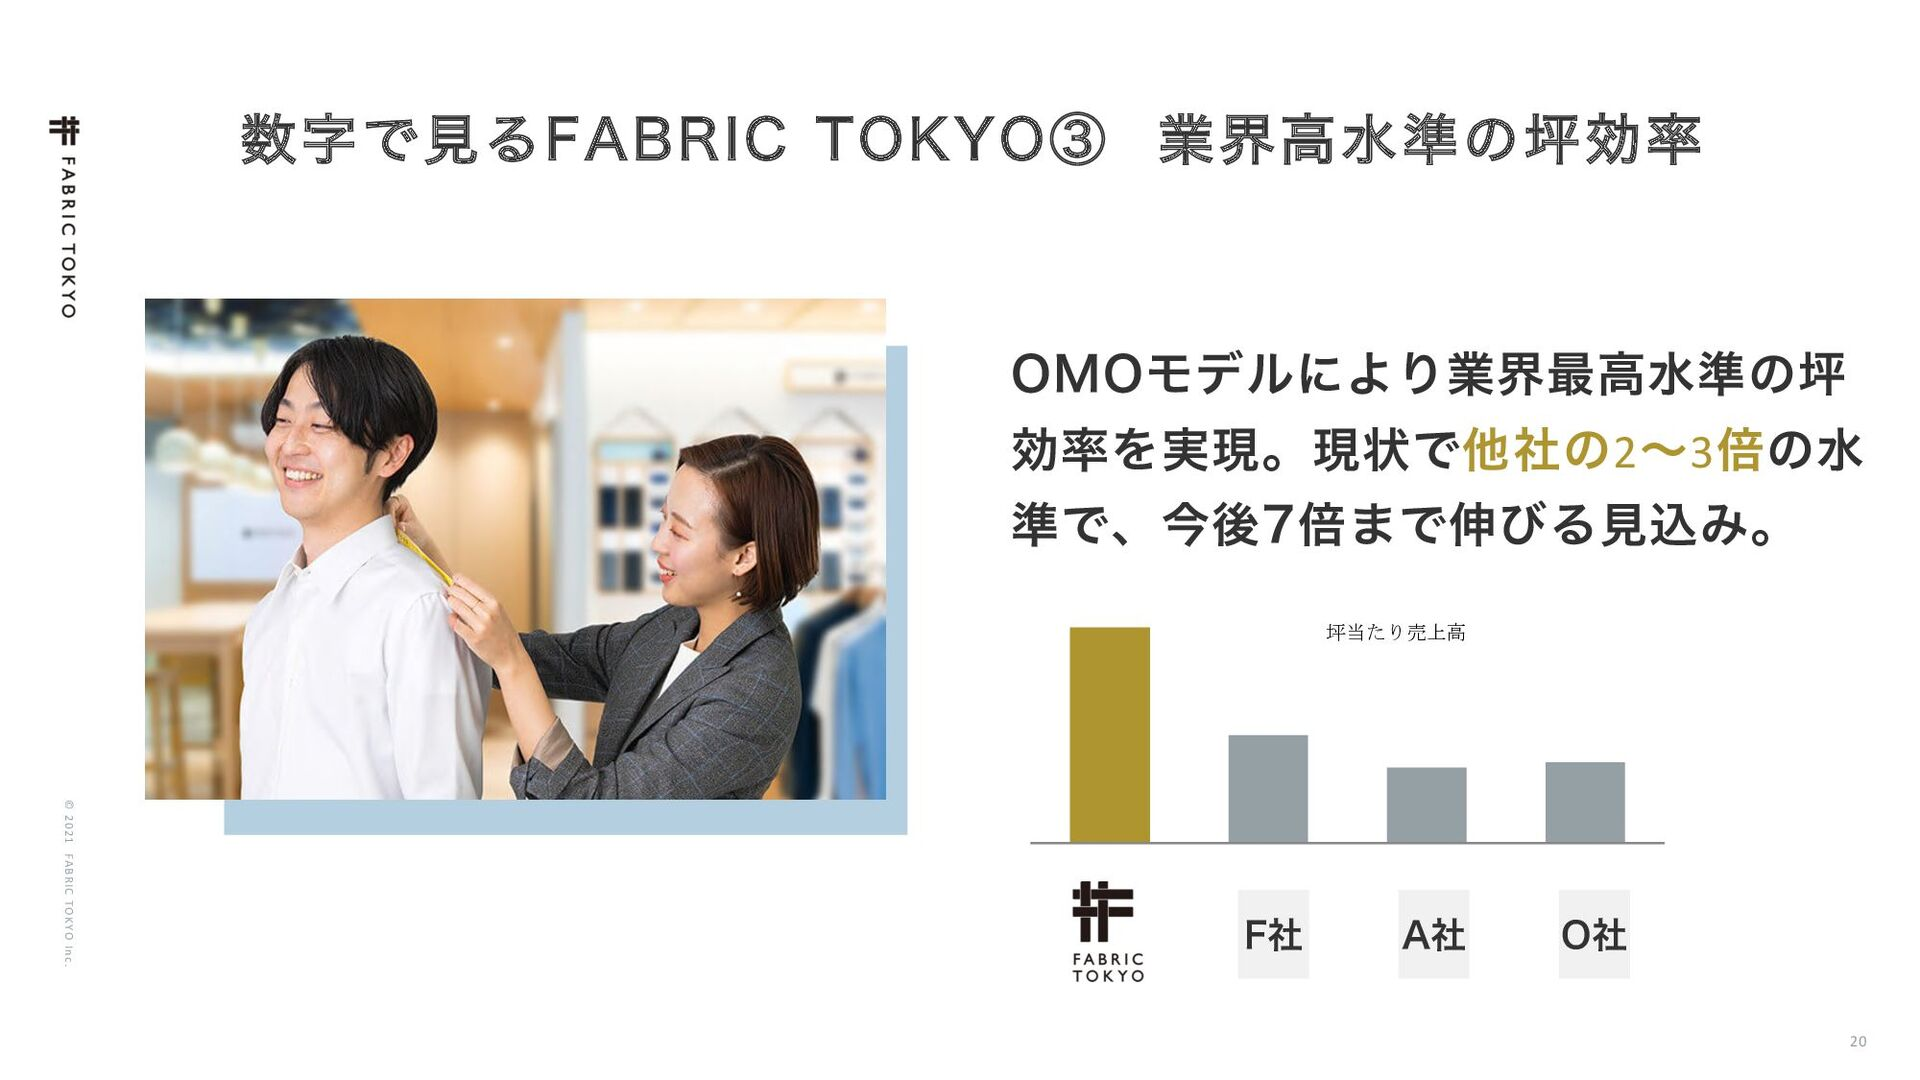 "© 2021 FABRIC TOKYO Inc. 20 ͰݟΔ'""#3*$ 50,:0ᶄ ..."